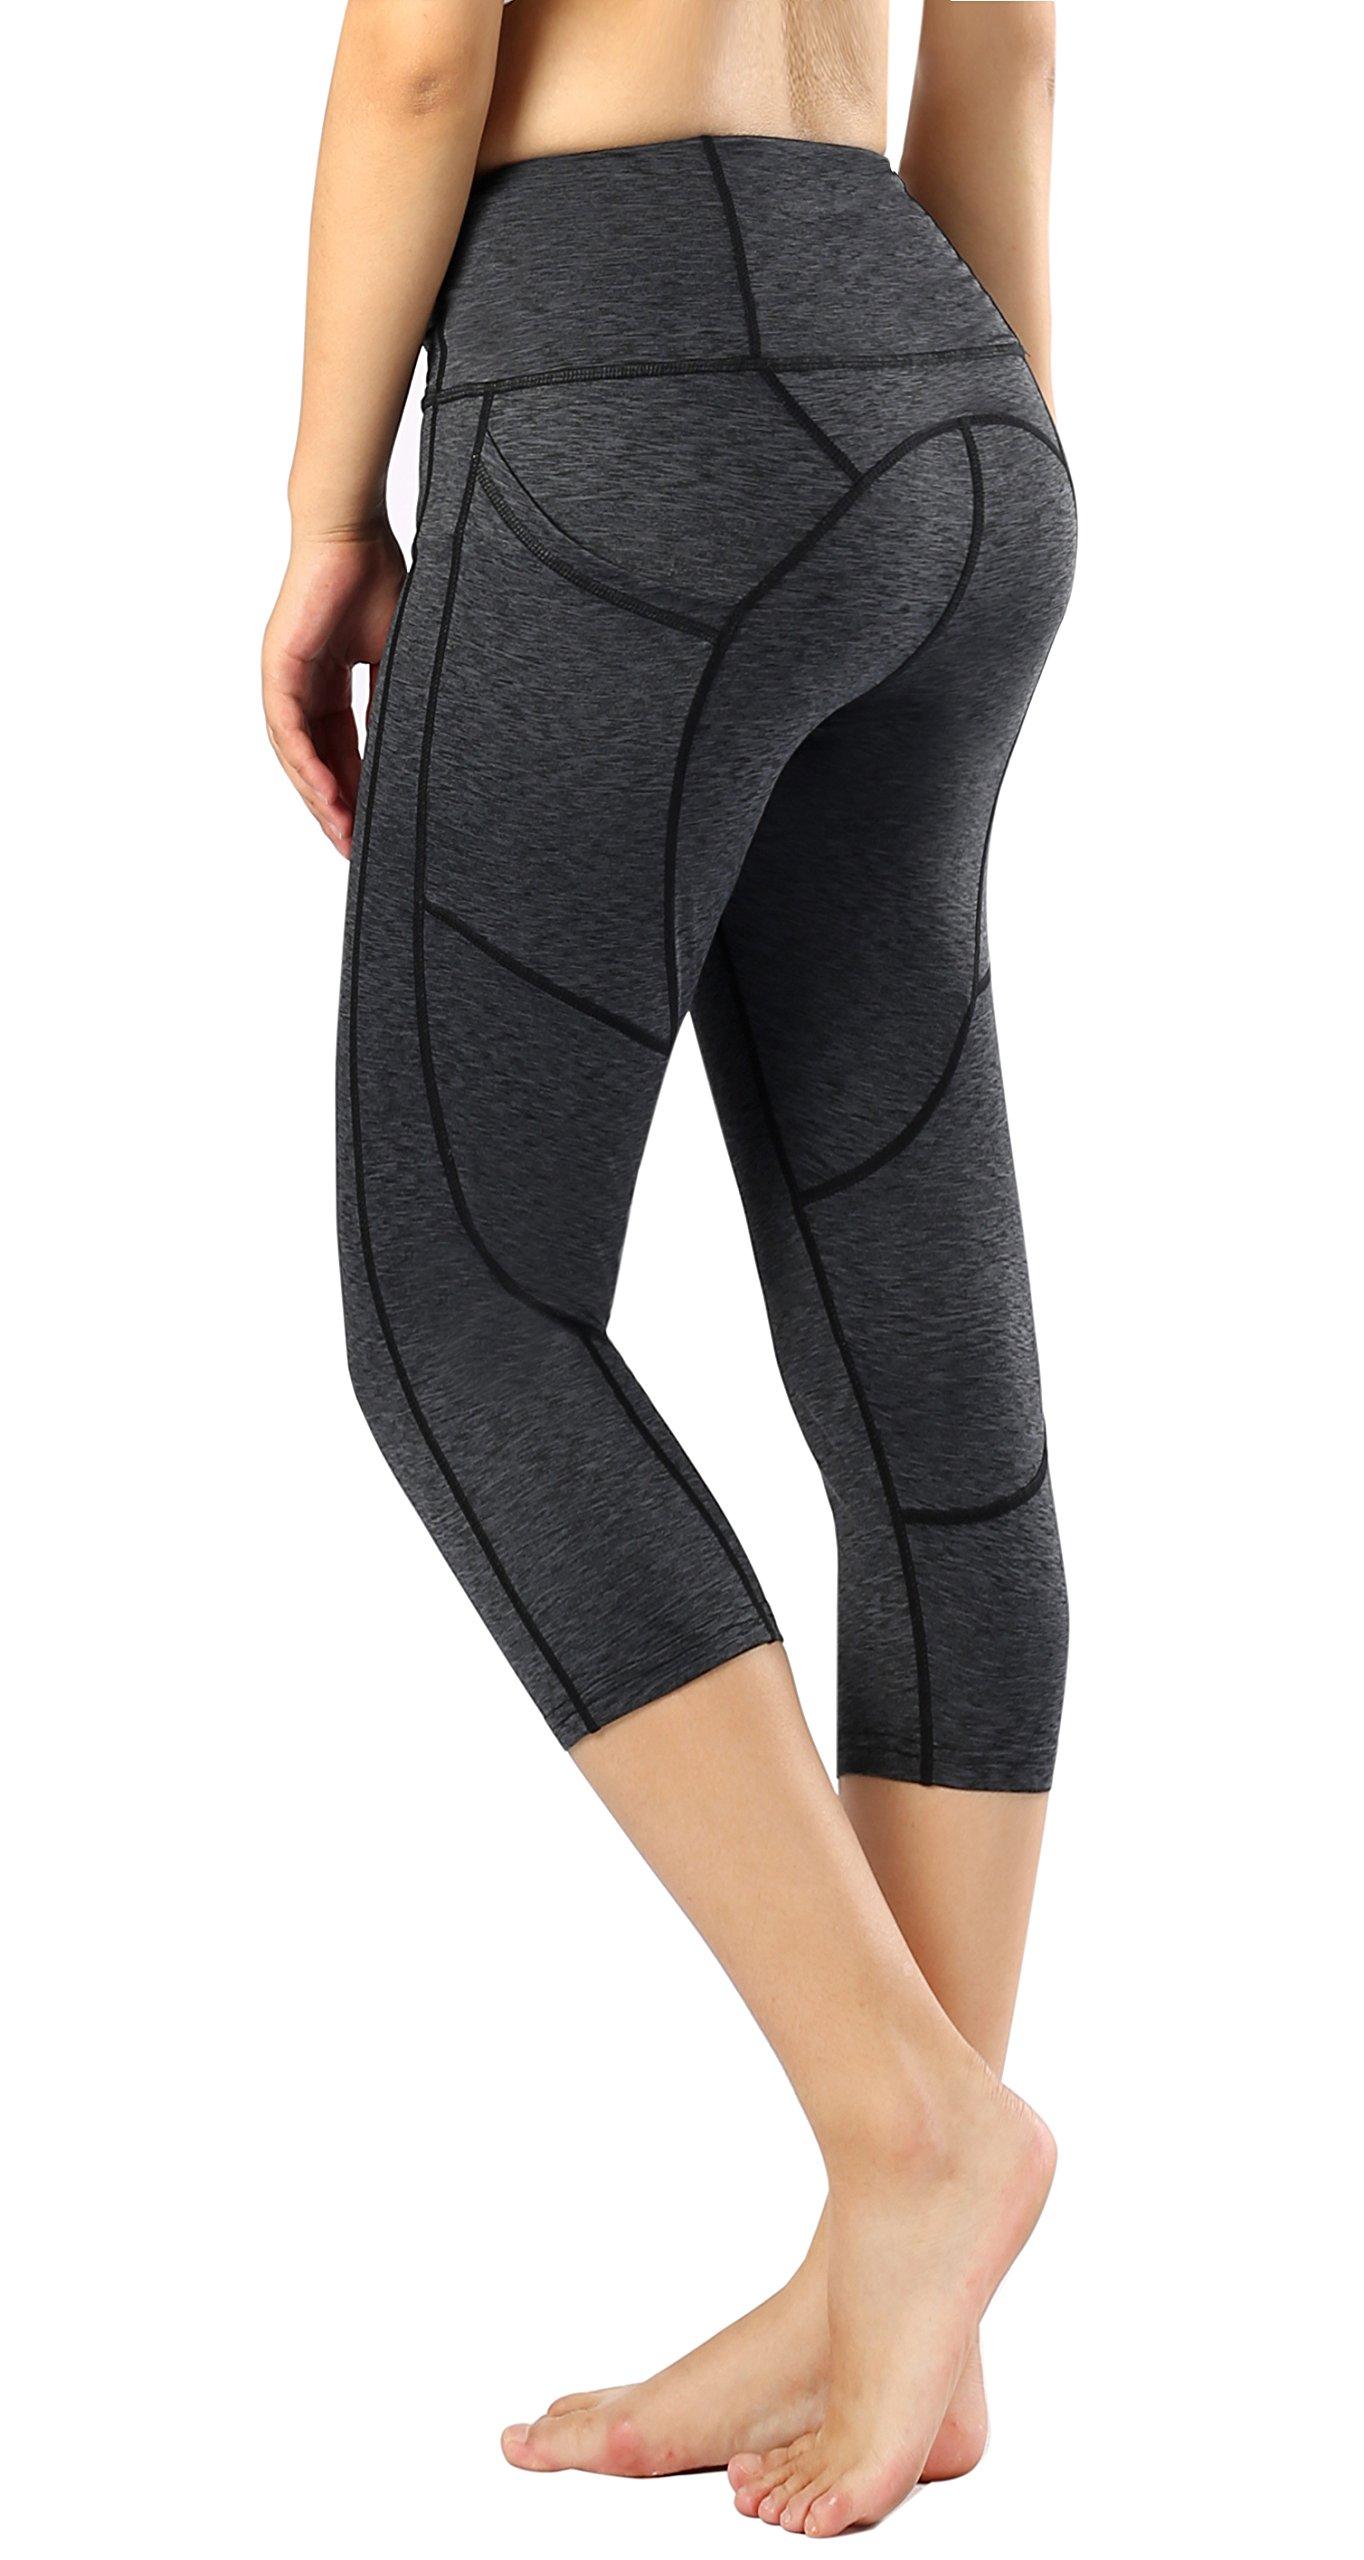 Sugar Pocket Women's Capris Tights Workout Running Leggings Yoga Pants S(09)